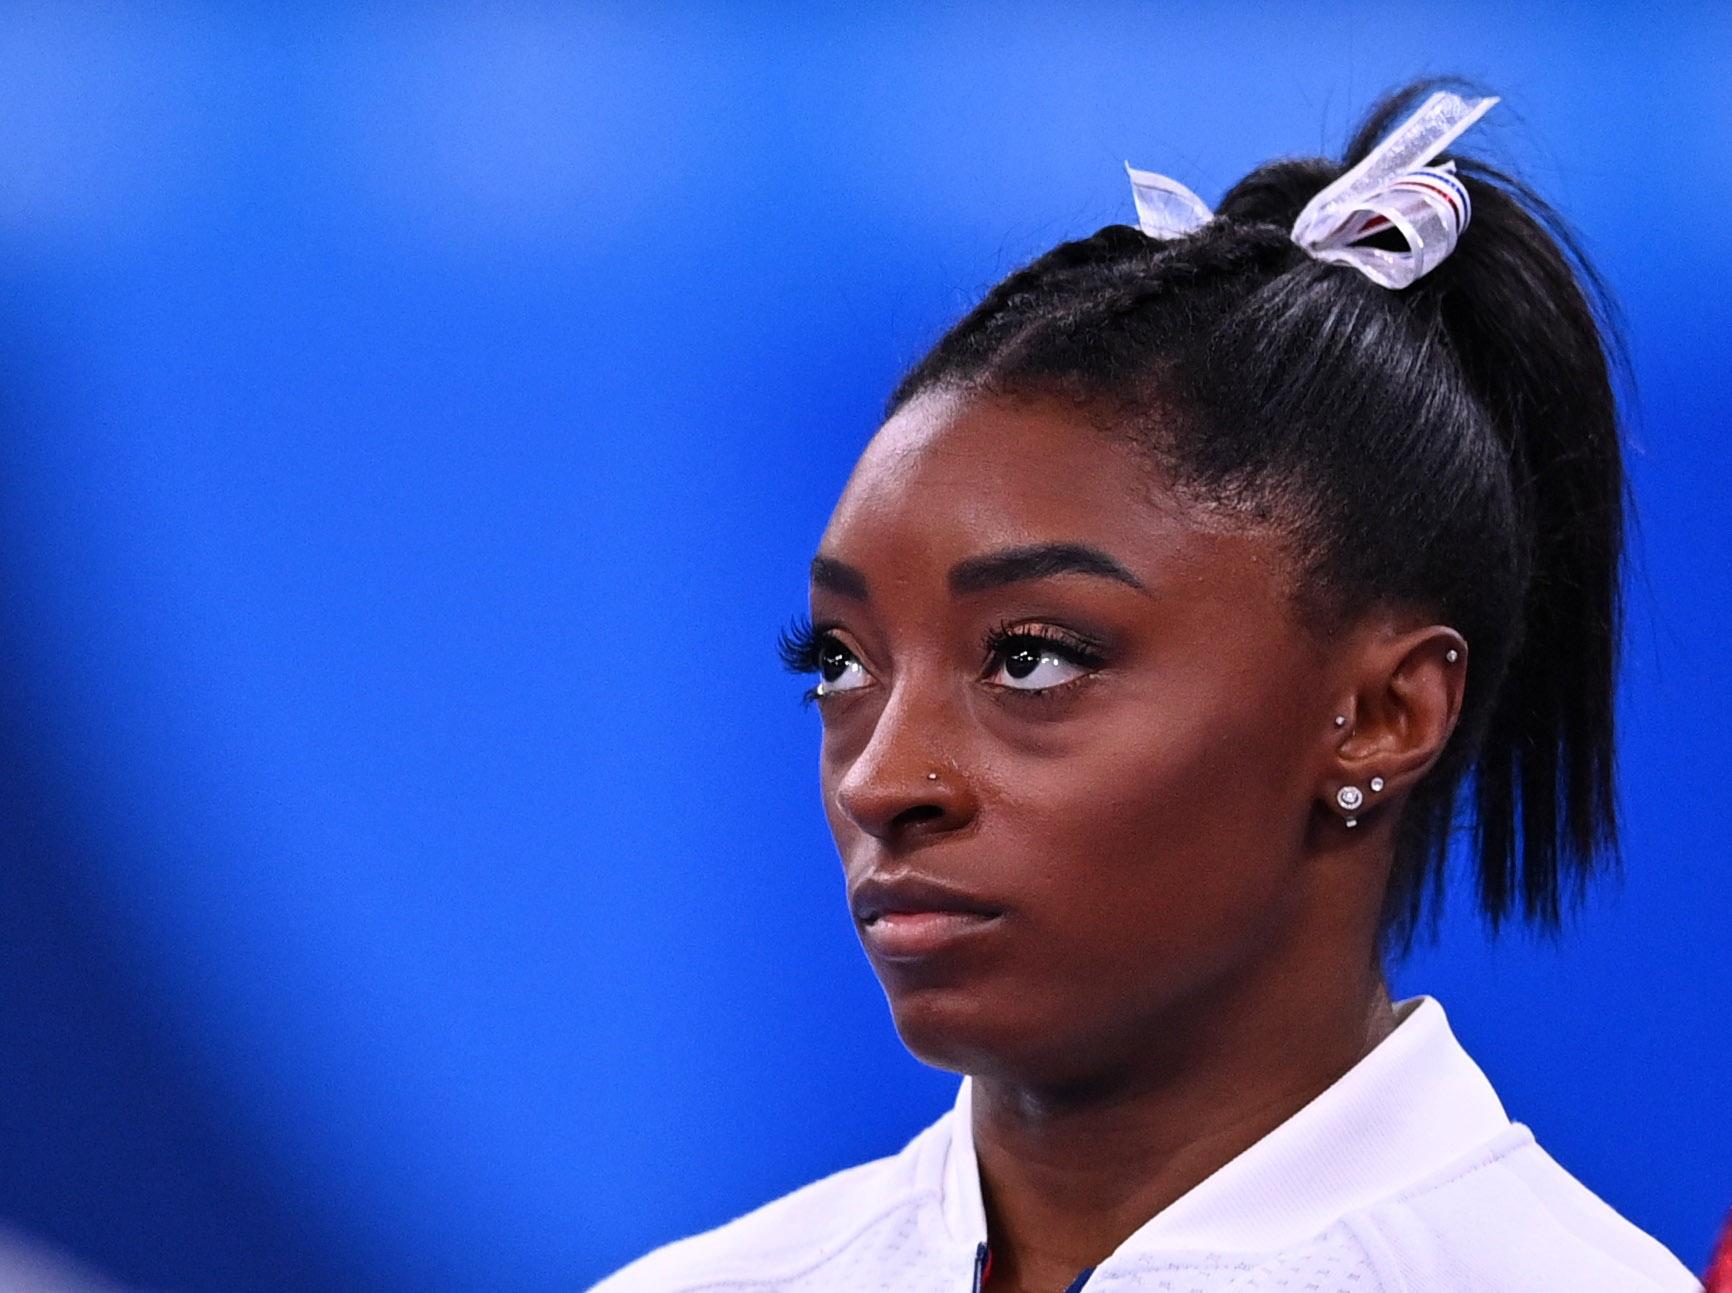 Tokyo 2020 Olympics - Gymnastics - Artistic - Women's Team - Final - Ariake Gymnastics Centre, Tokyo, Japan - July 27, 2021. Simone Biles of the United States during the Women's Team Final REUTERS/Dylan Martinez